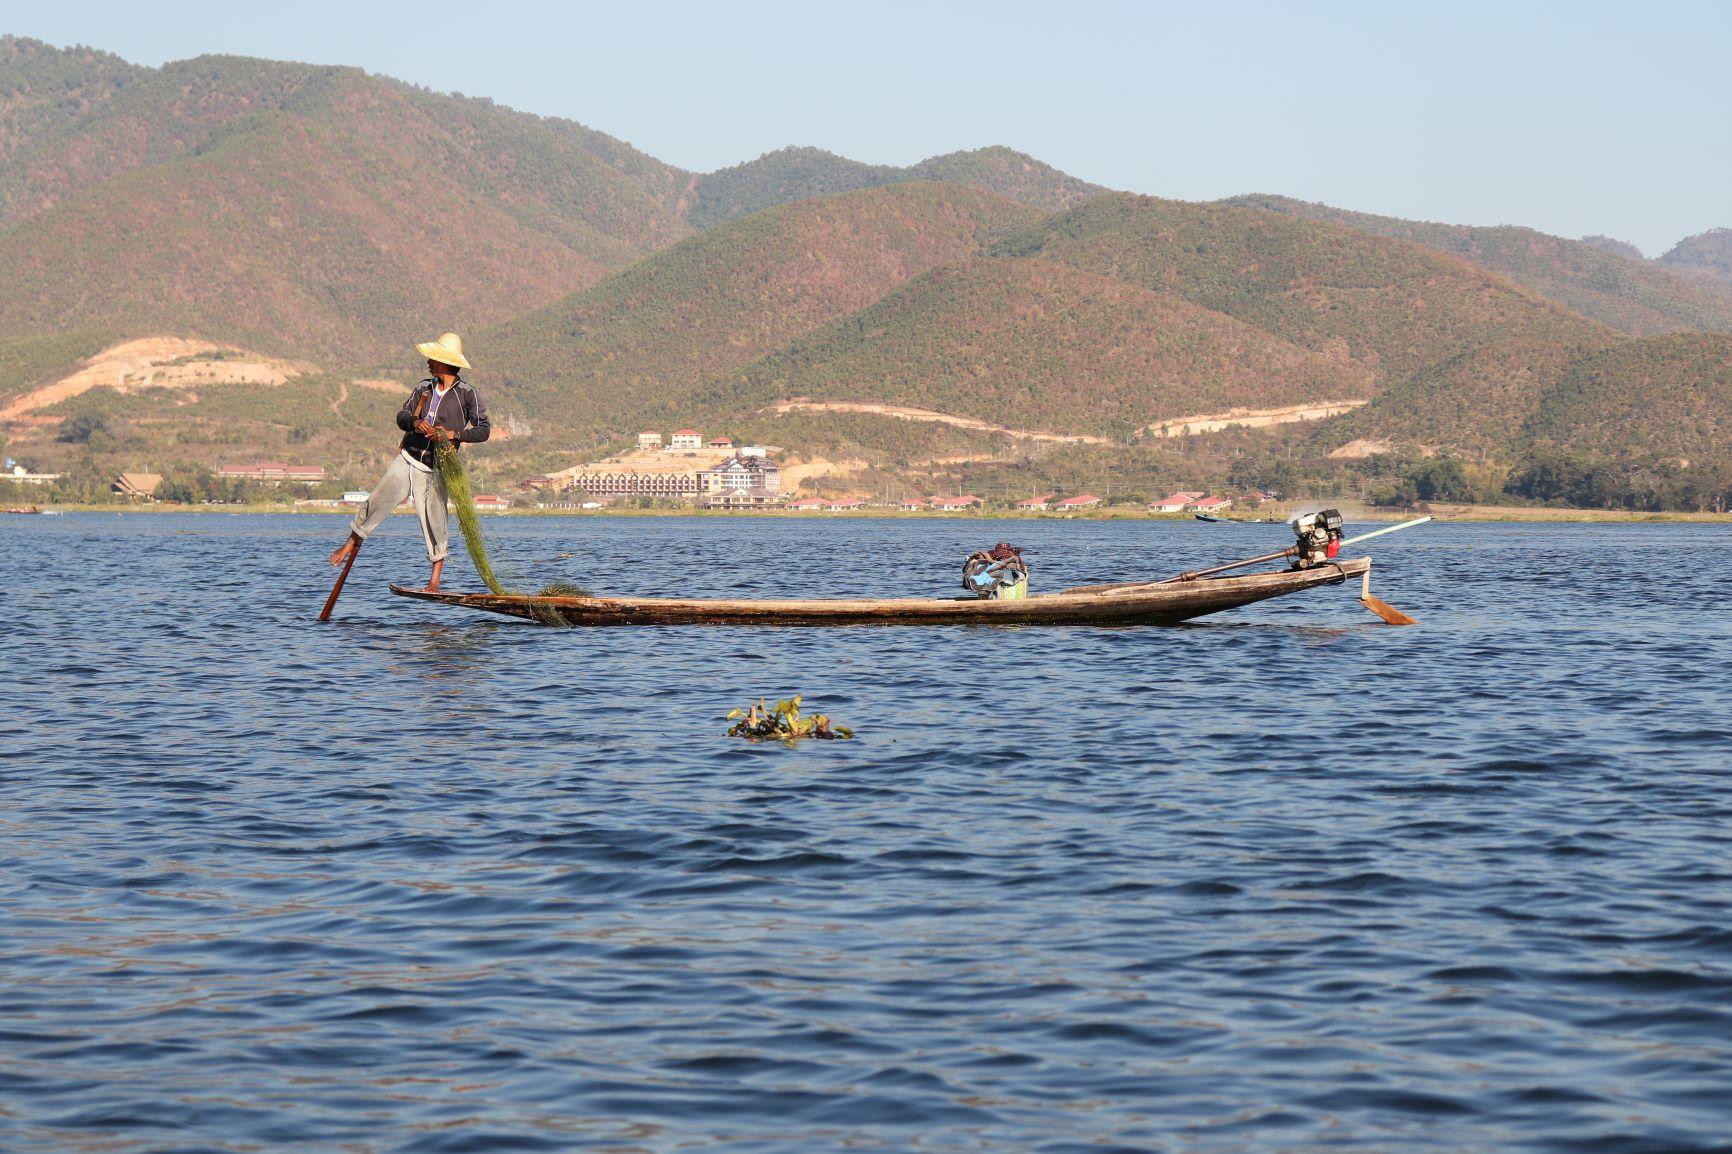 Inthar fisherman